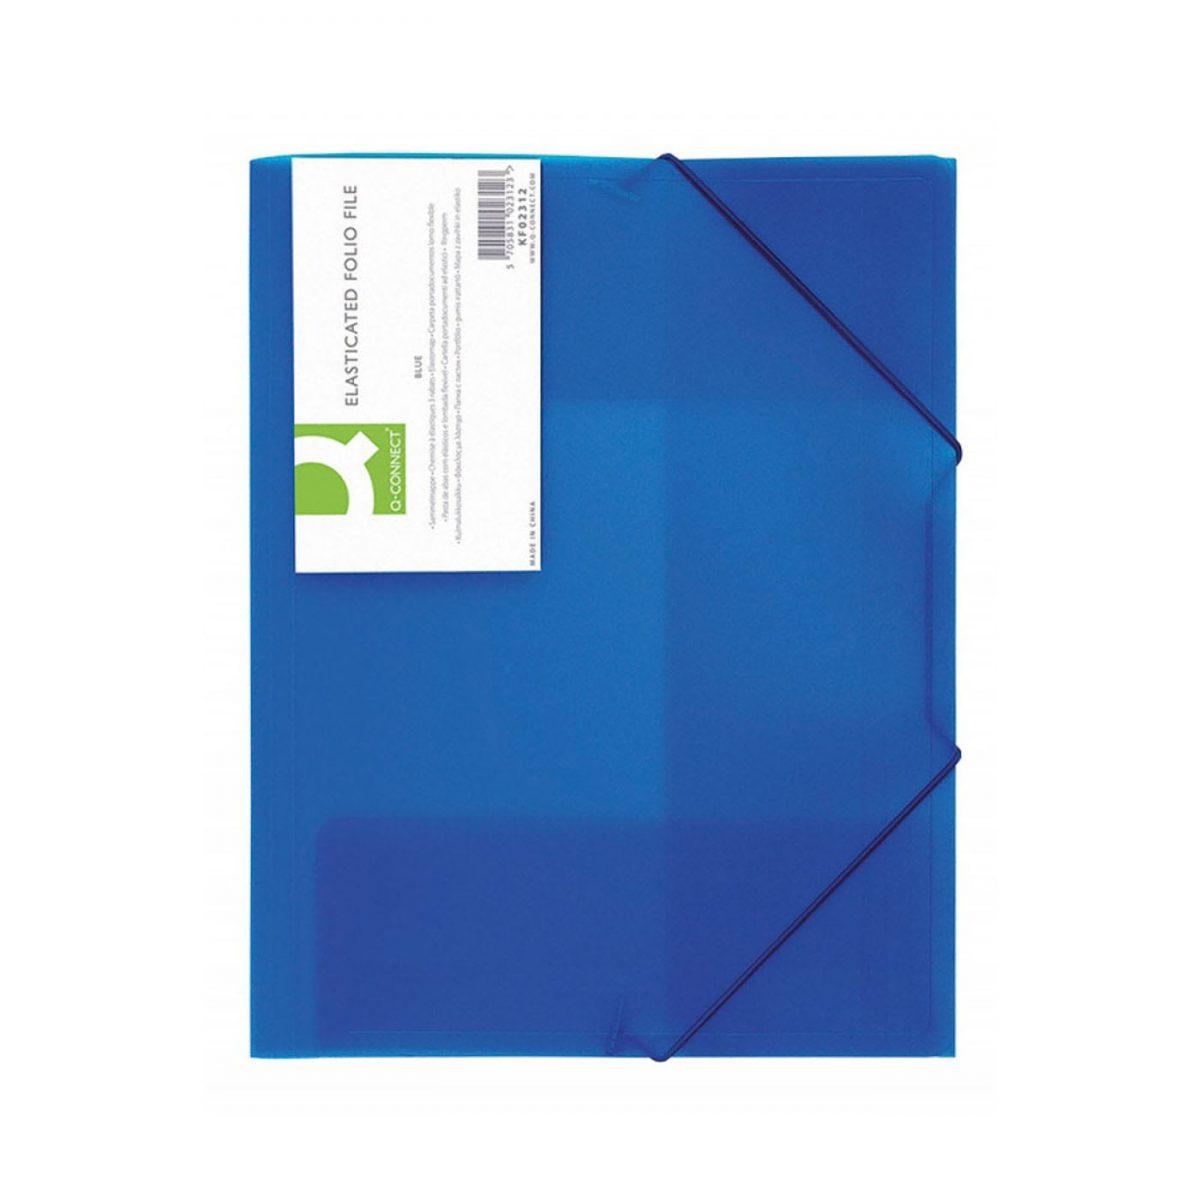 Mapa plastic cu elastic pe colturi, 400 microni, Q-Connect - albastru transparent